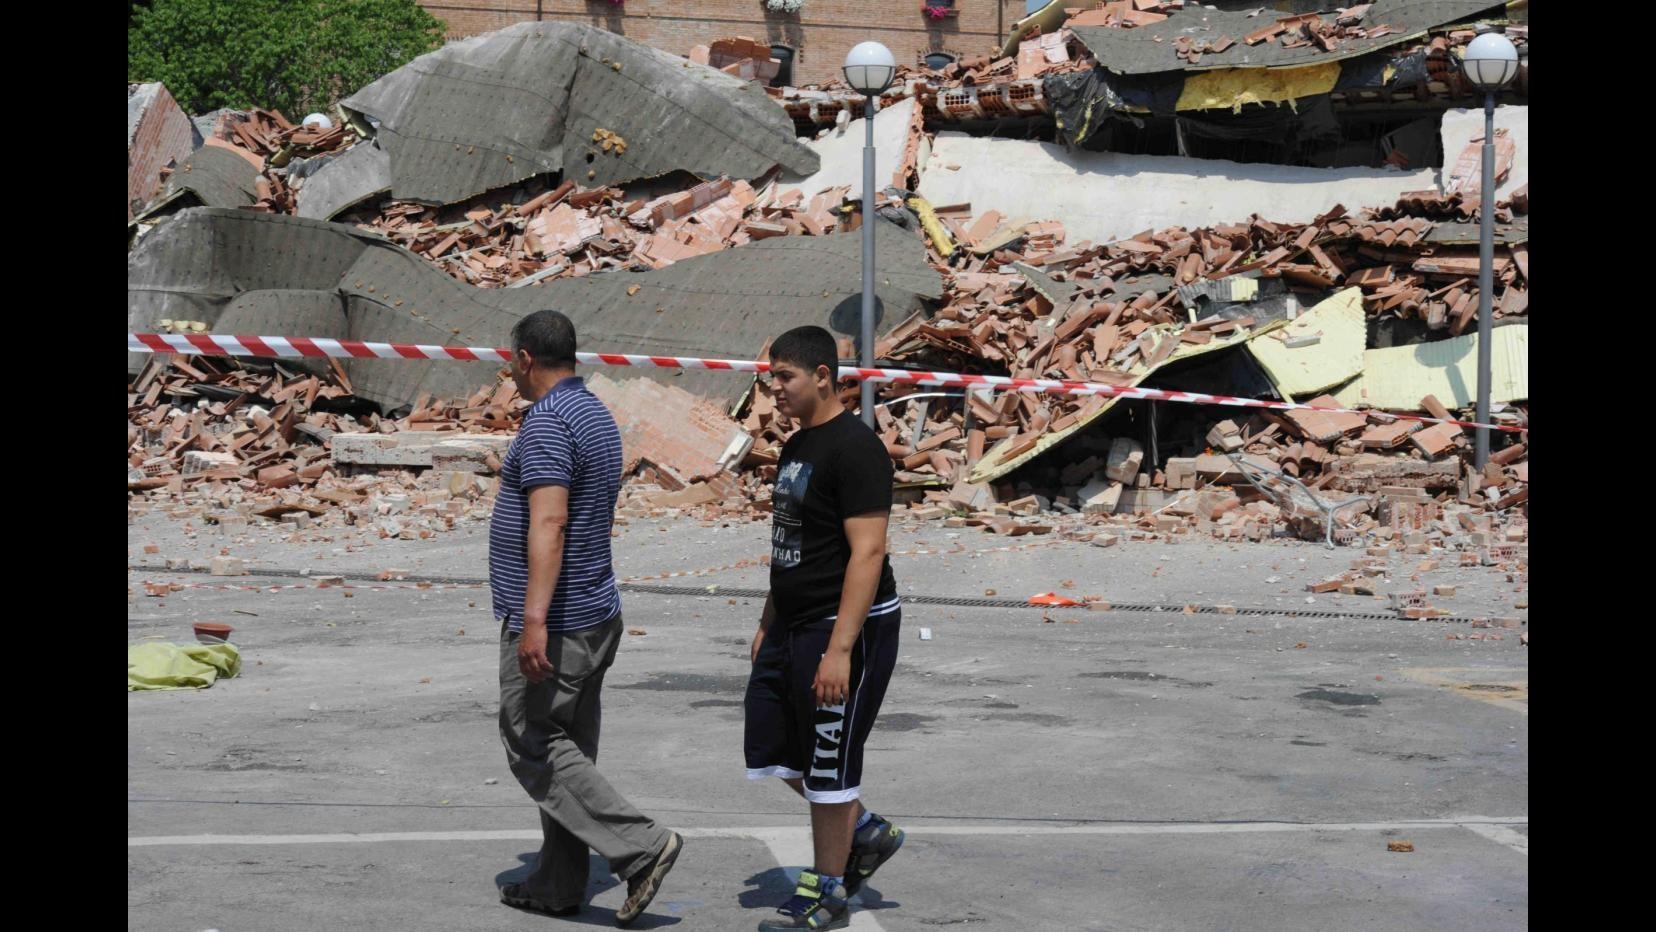 Sisma L'Aquila, attesa sentenza Cassazione su 'Grandi rischi'